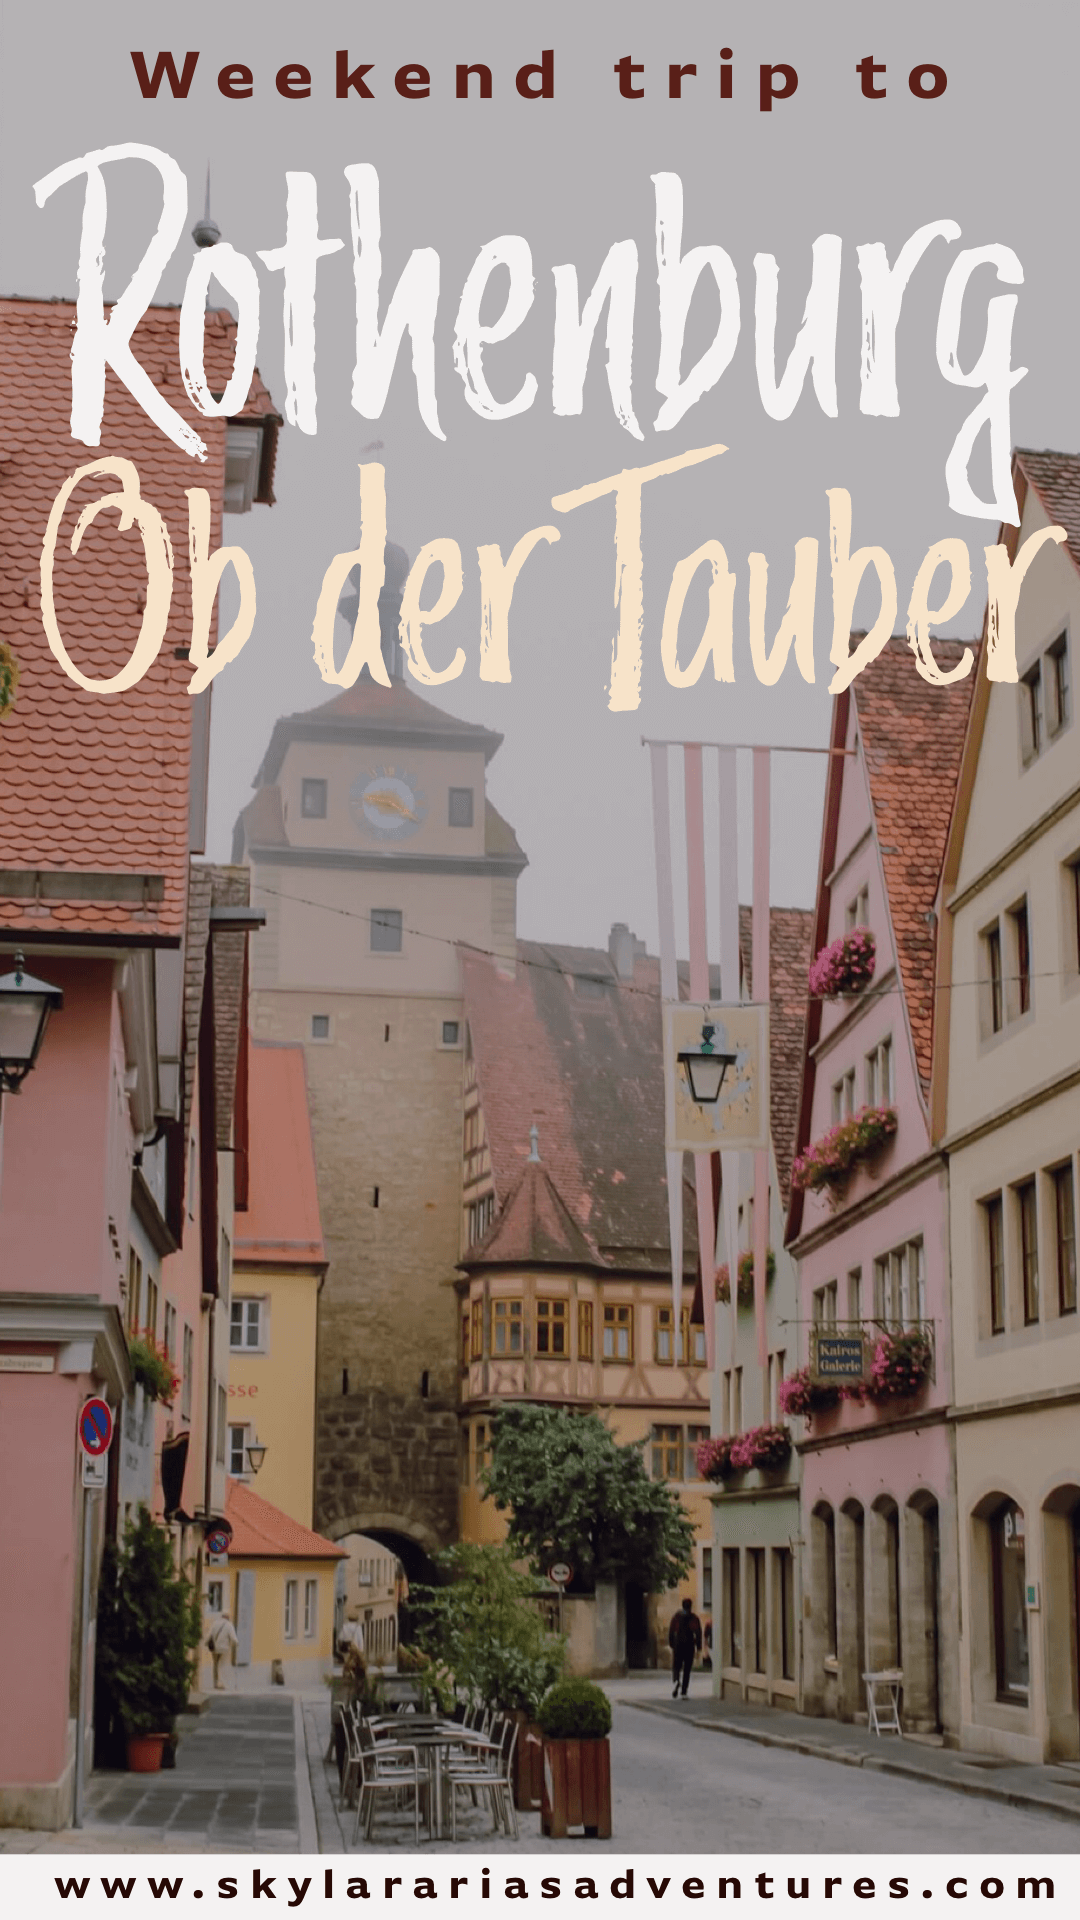 Weekend Trip To Rothenburg Ob Der Tauber With Kids Skylar Aria S Adventures Trip Rothenburg Weekend Trips